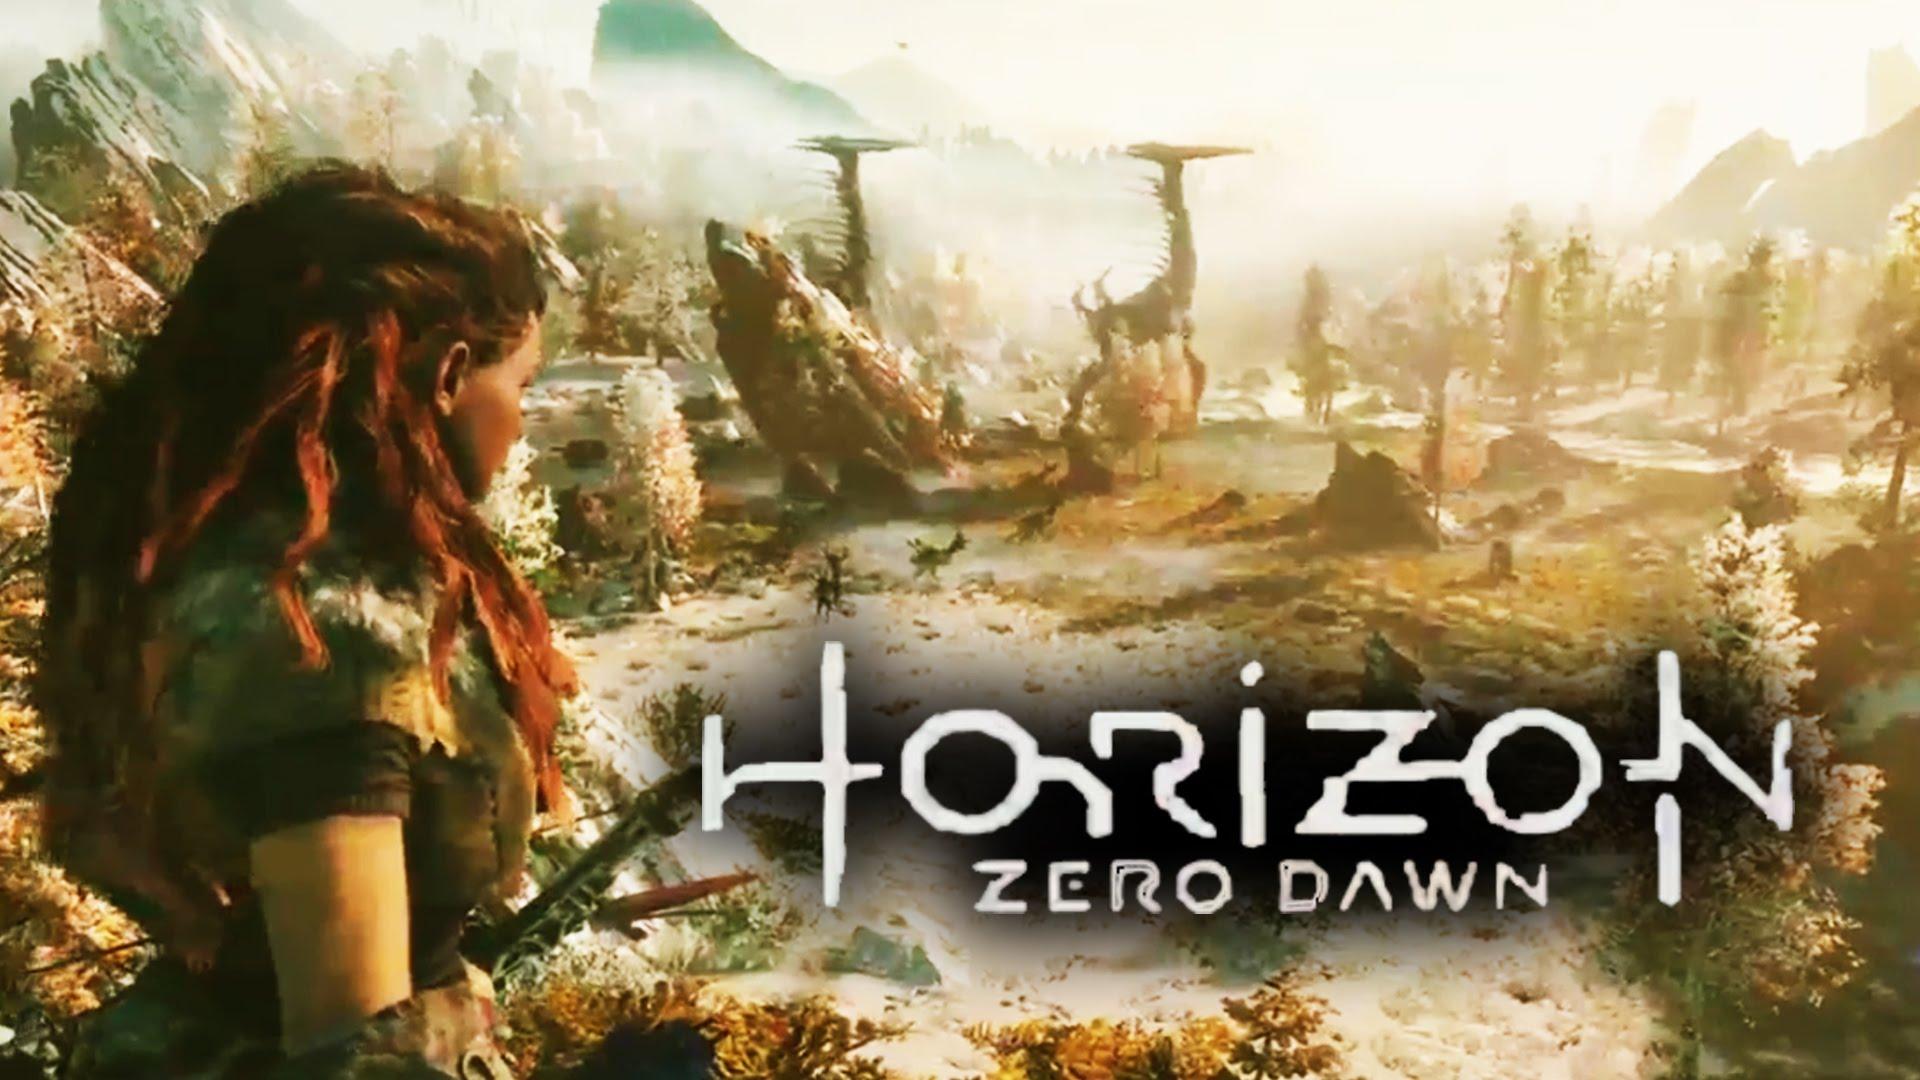 Zero Dawn – Horizon PS4 Bestpreis Preisvergleich CD Key